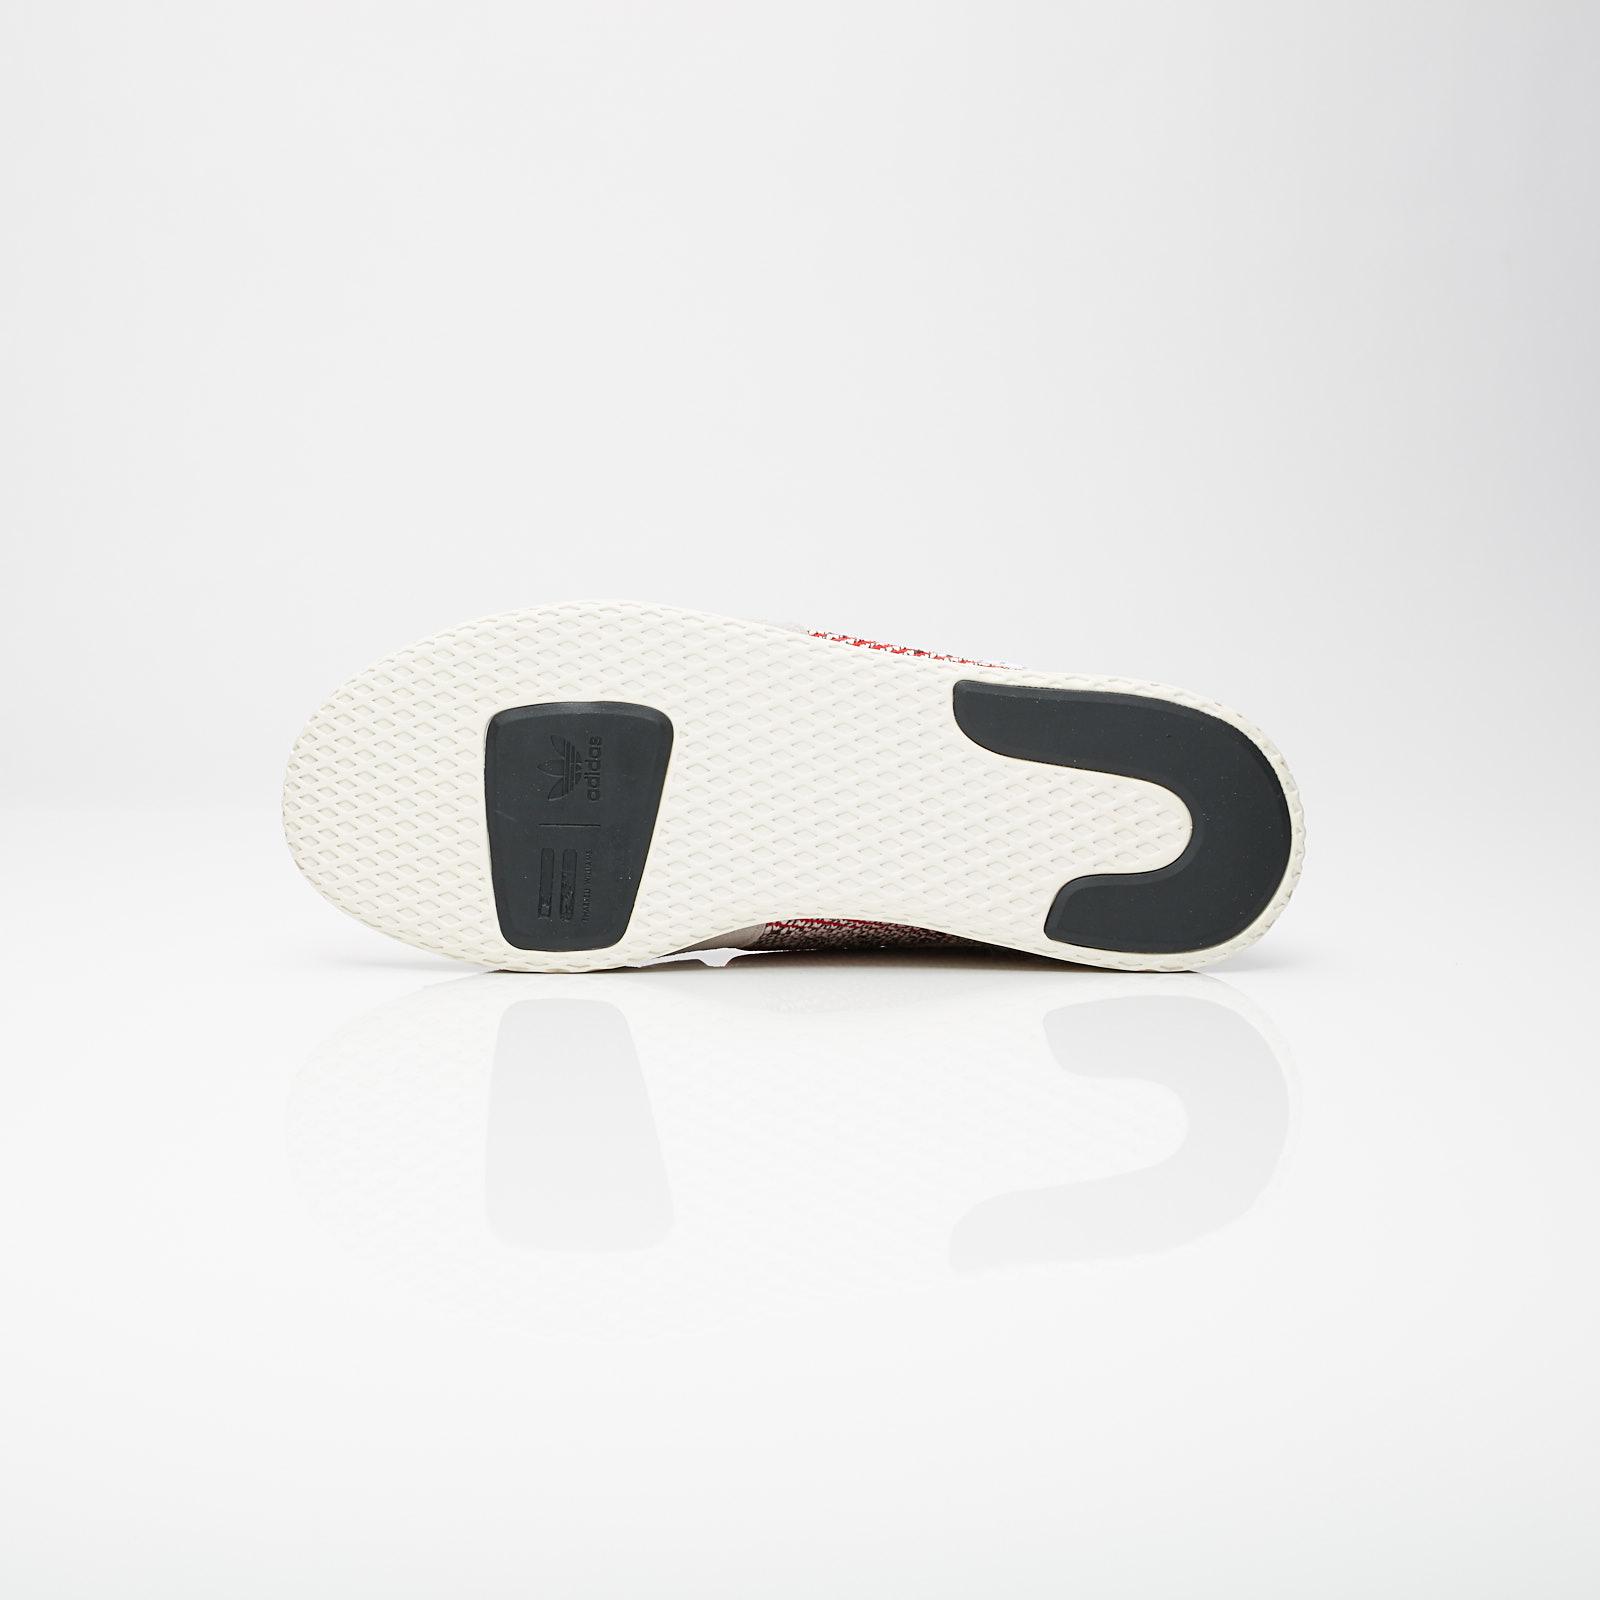 ... adidas Originals Solar Tennis HU V2 x Pharrell Williams ... 57bfef2acf0